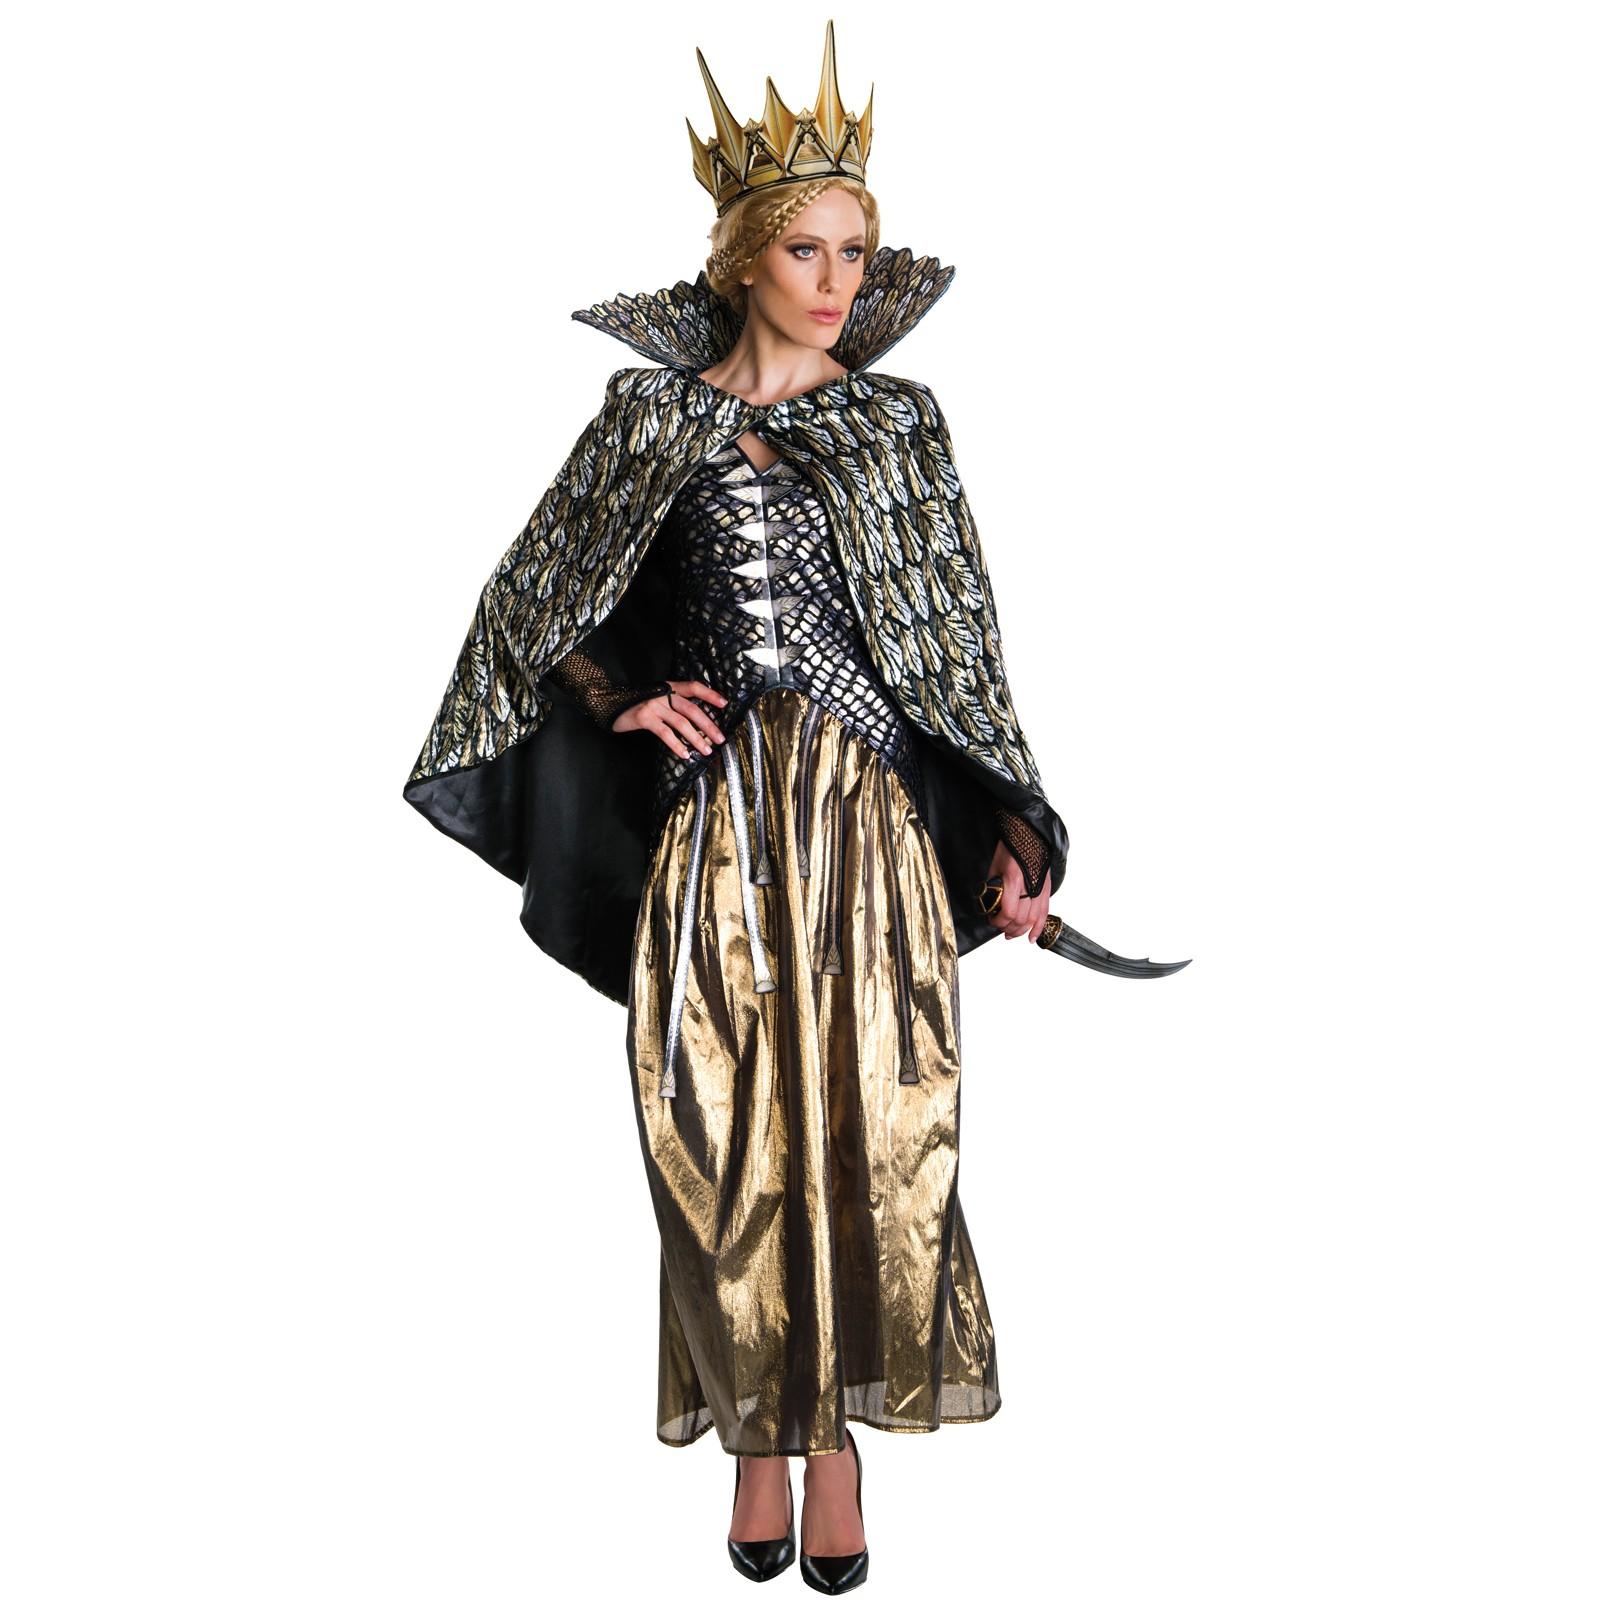 Snow White & The Huntsman Deluxe Queen Ravenna Costume